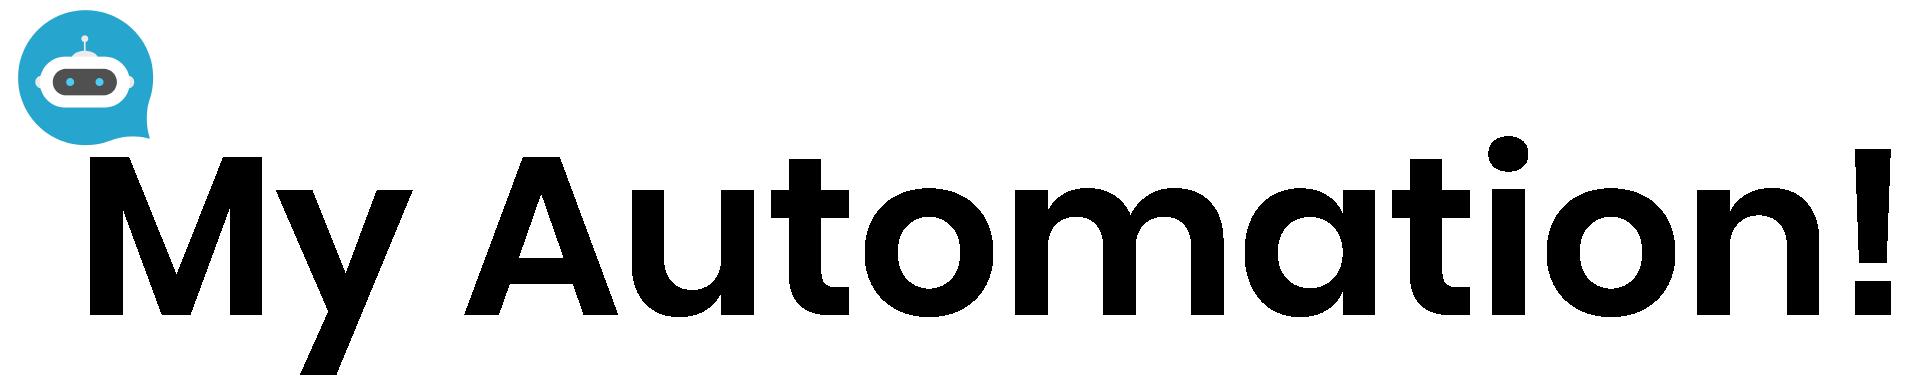 myautmation_logo2